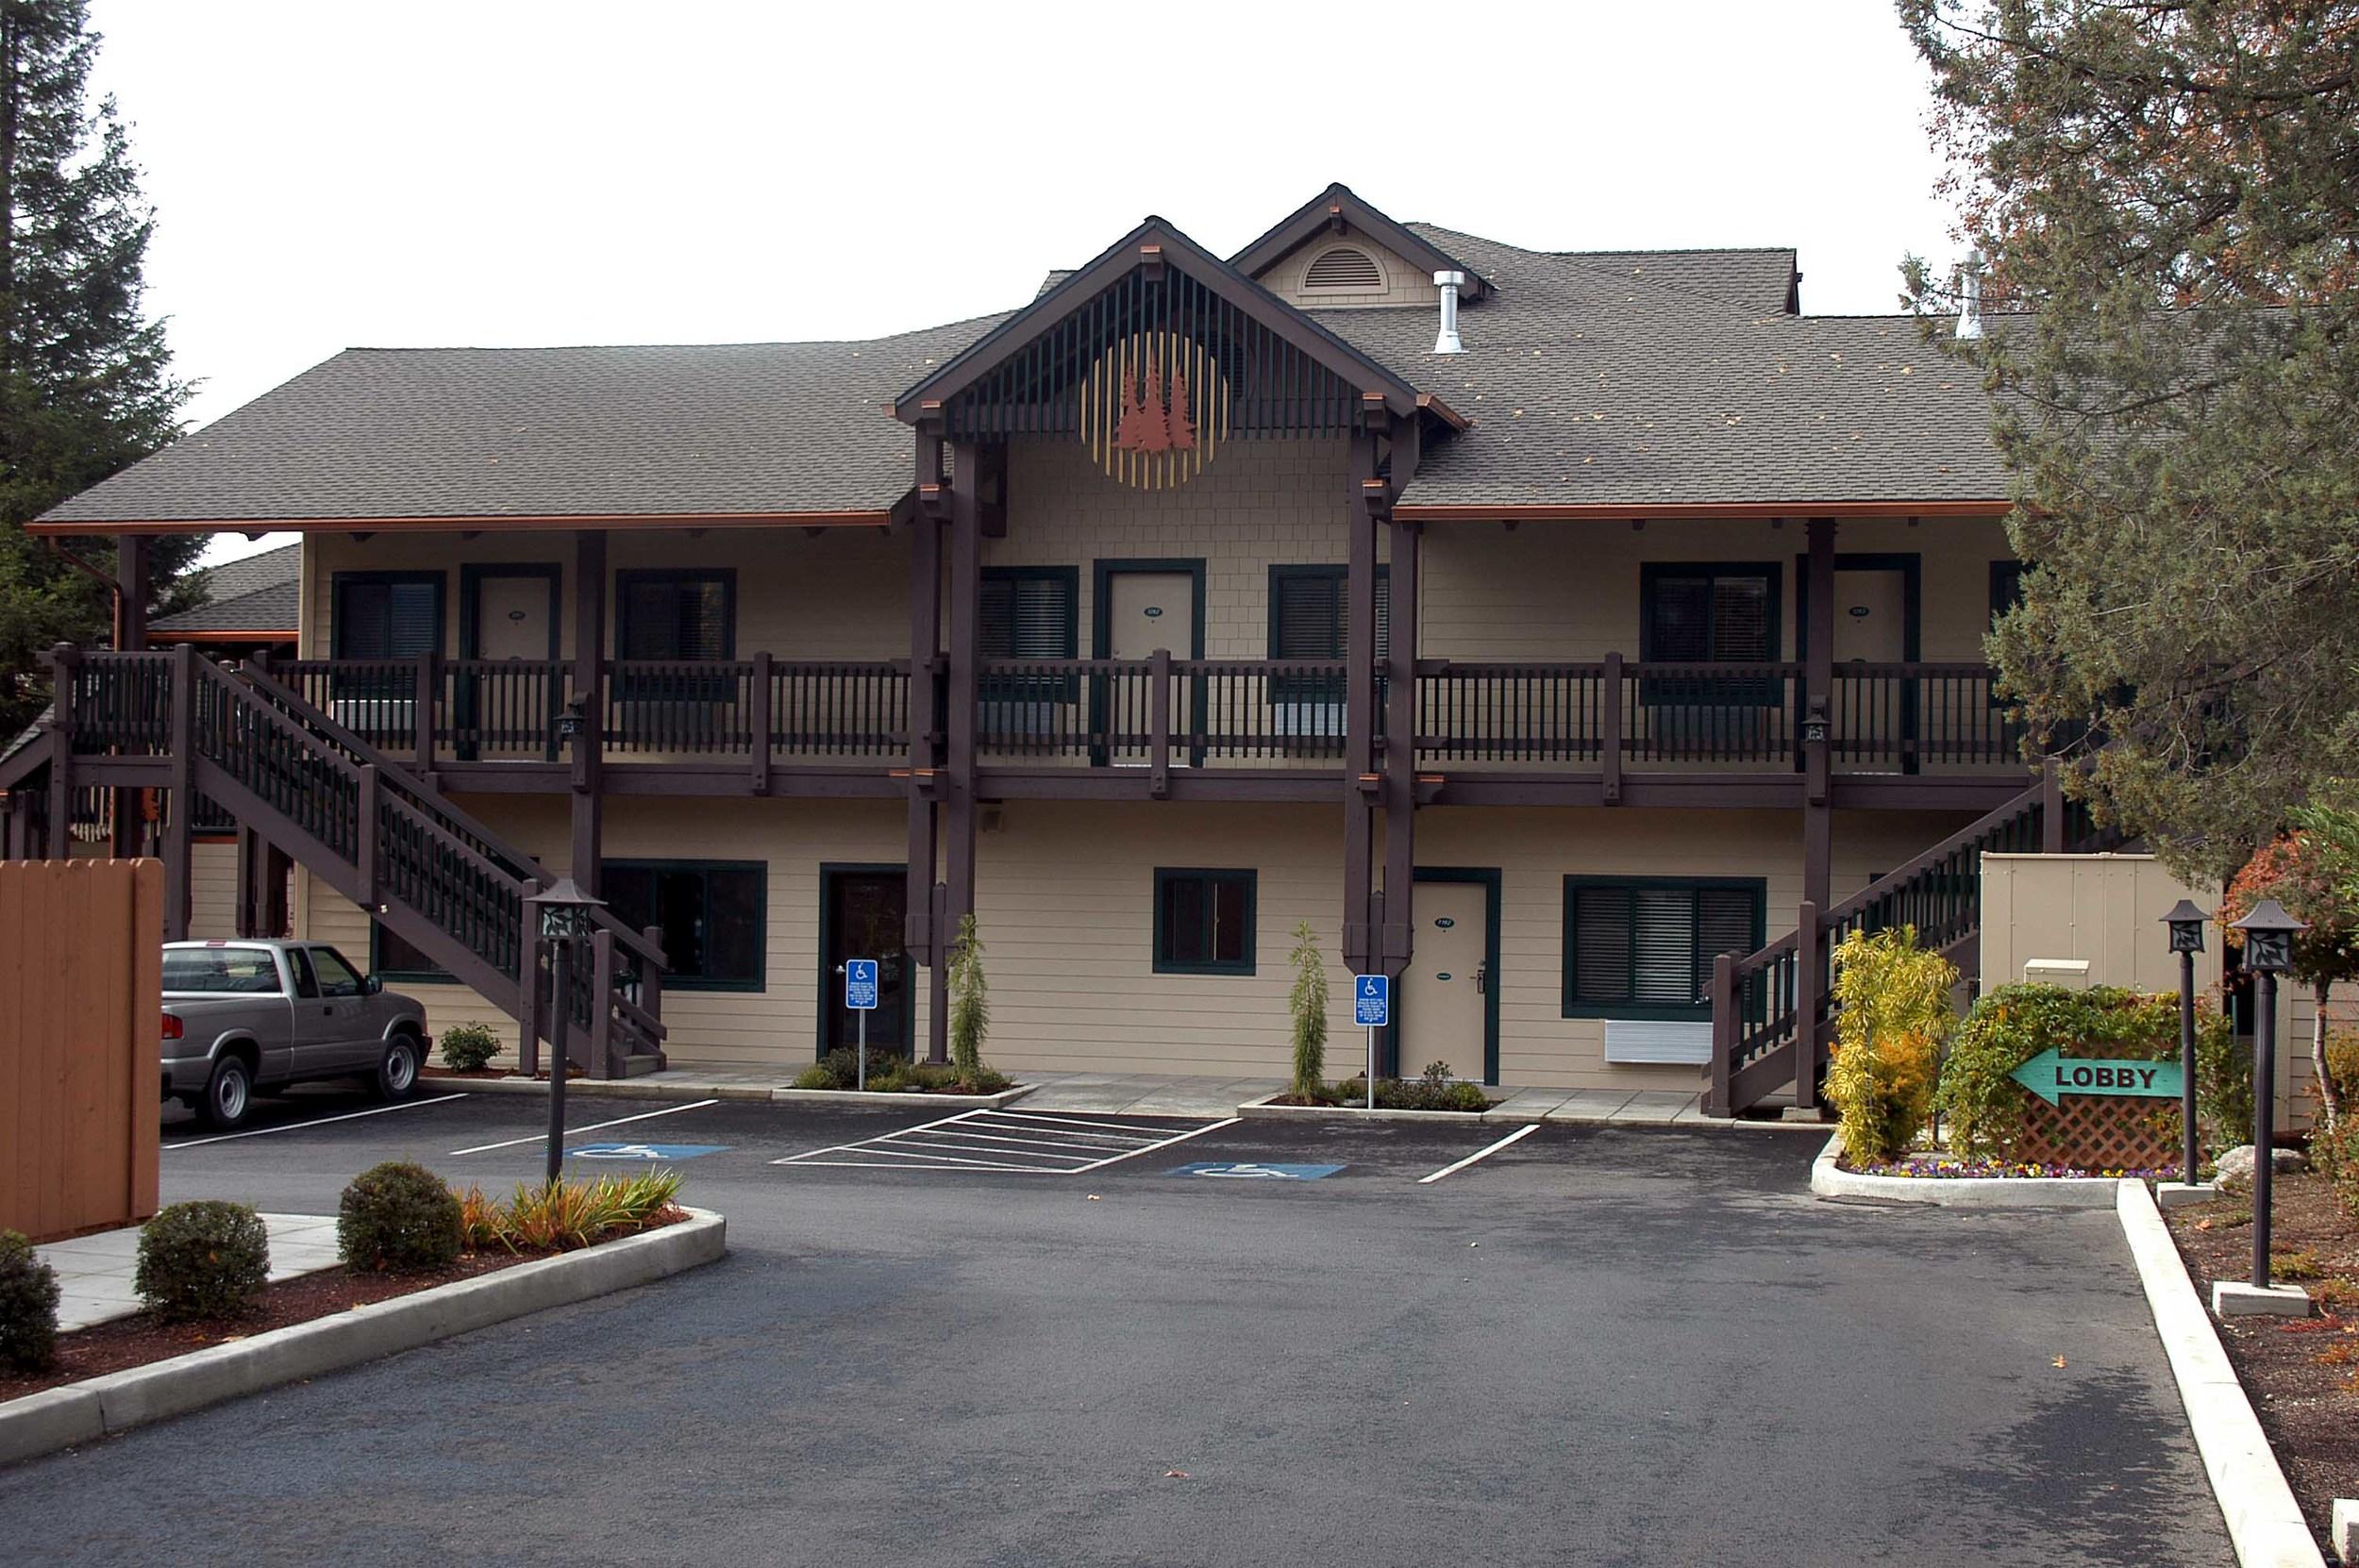 Redwood Motel, New Building B Grants Pass, Oregon Heiland Hoff, Project Architect